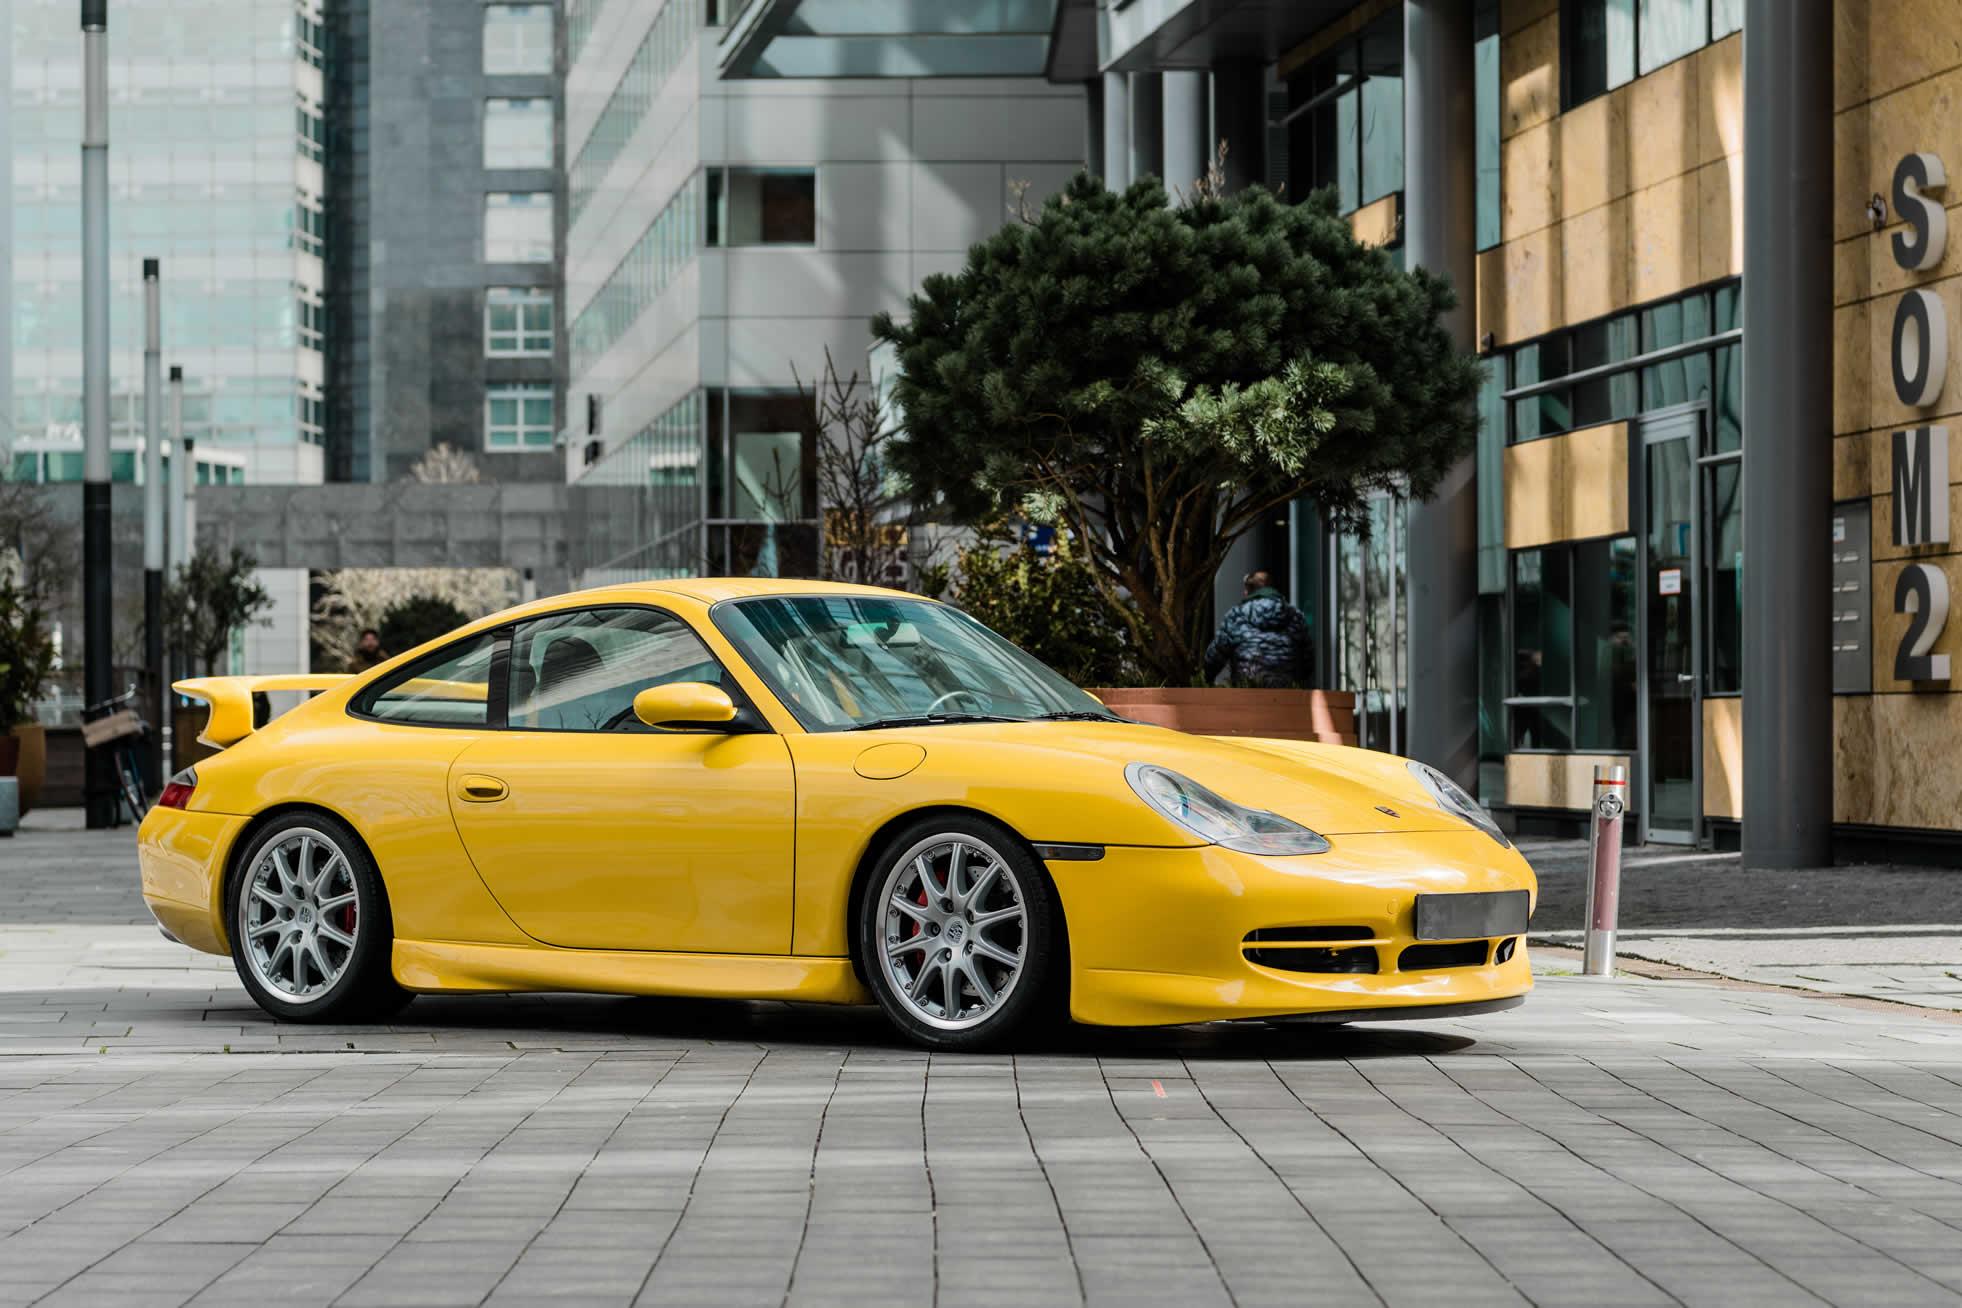 For sale, 2001 Porsche 996 GT3, Sports Purpose